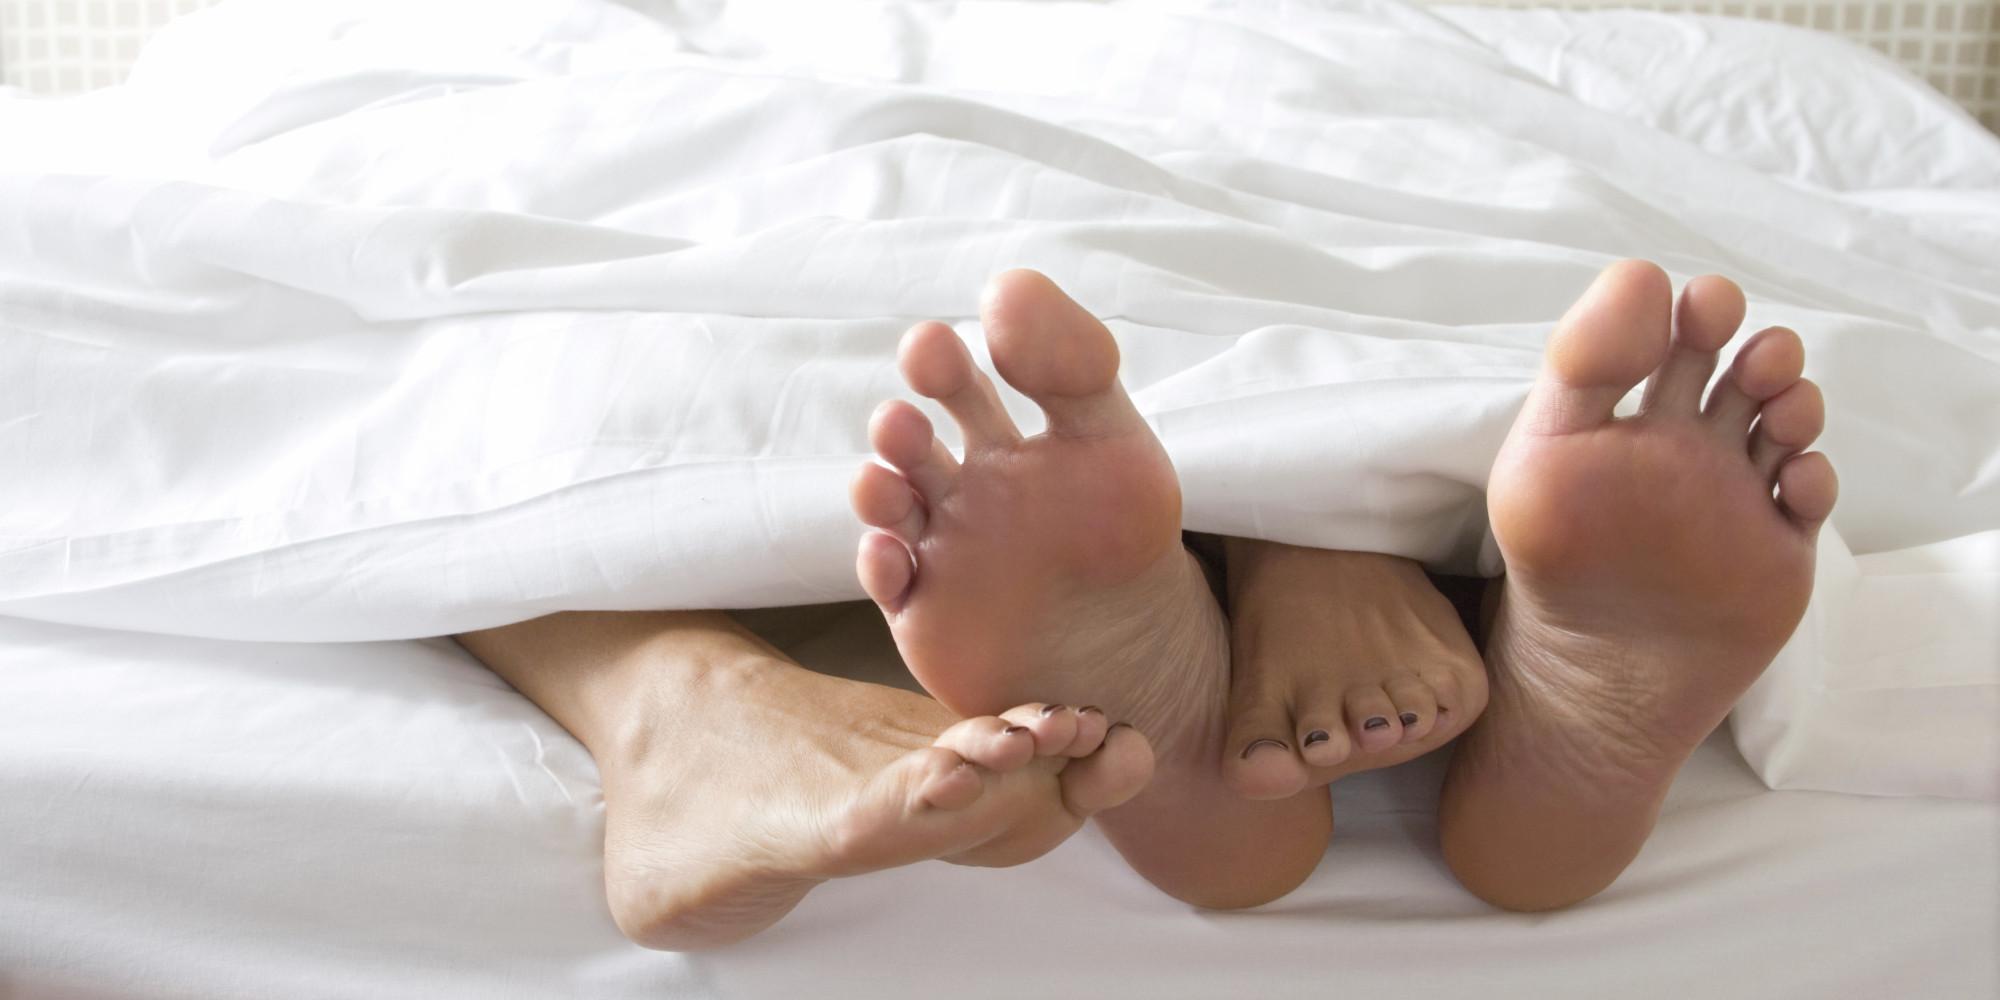 Male enlargement treatment in Saudi Arabia